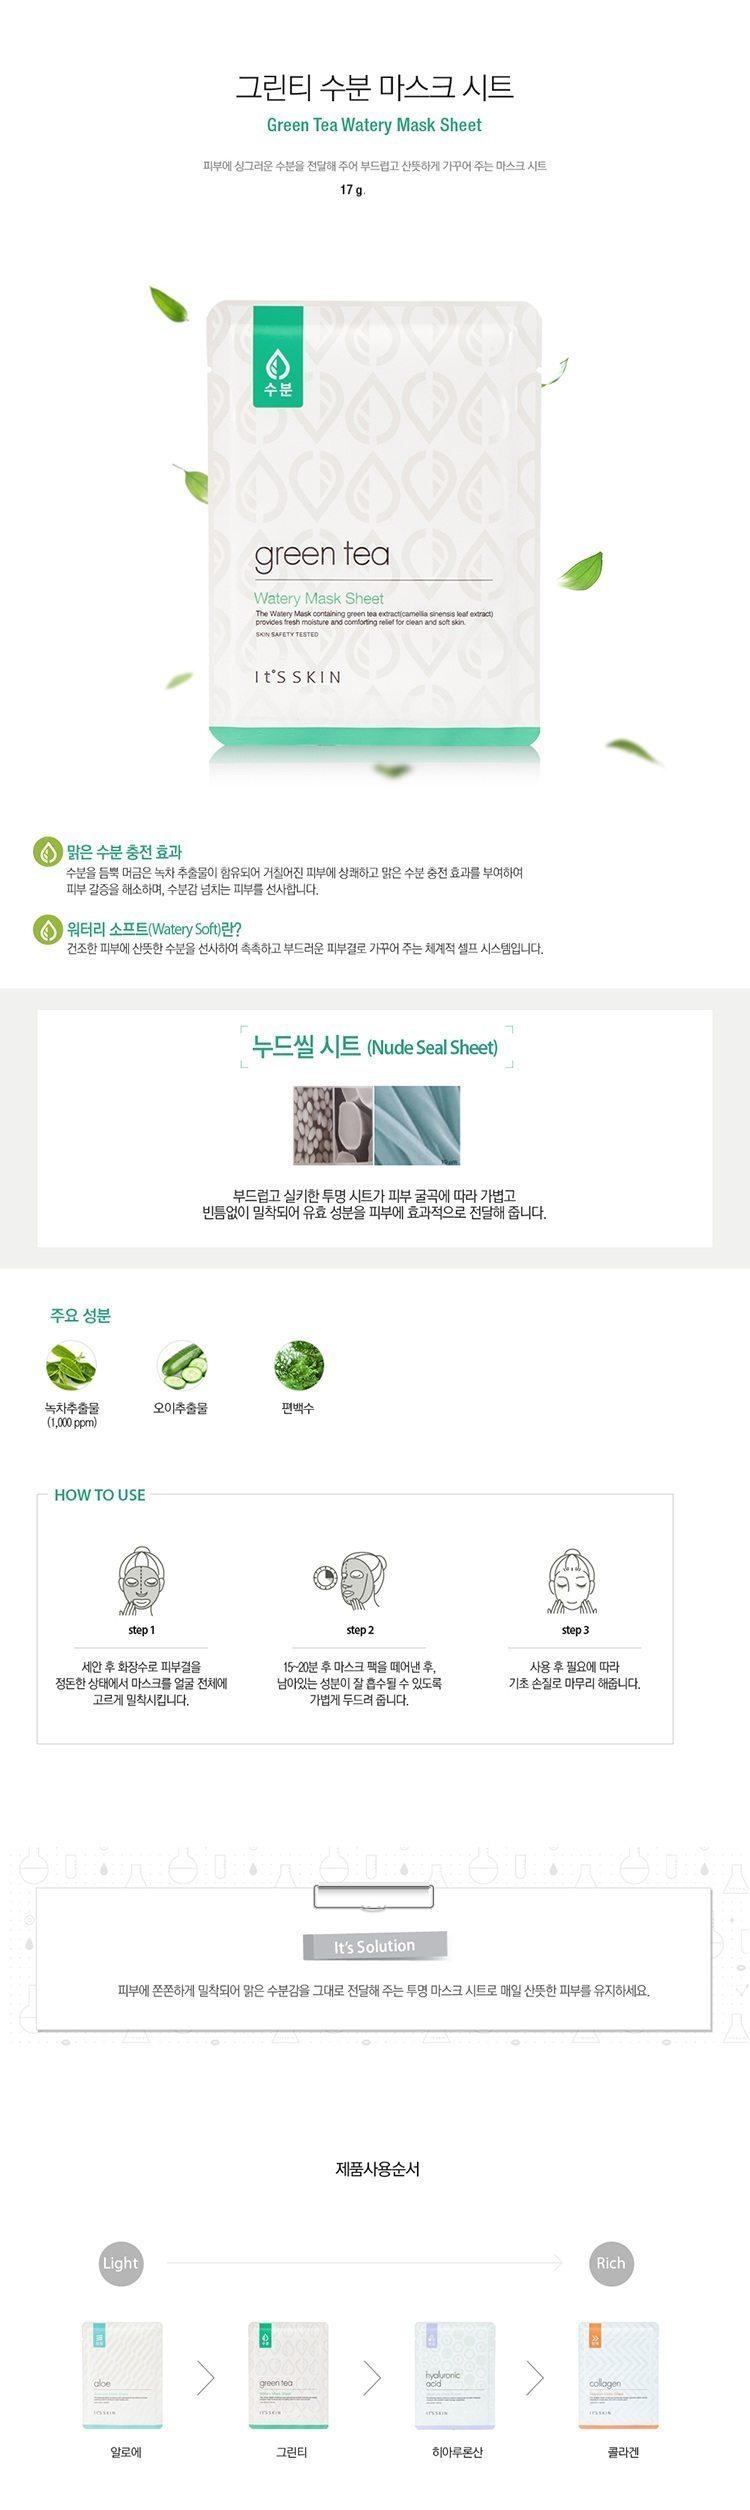 It's Skin Green Tea Watery Mask Sheet korean cosmetic skincare product online shop malaysia vietnam macau1